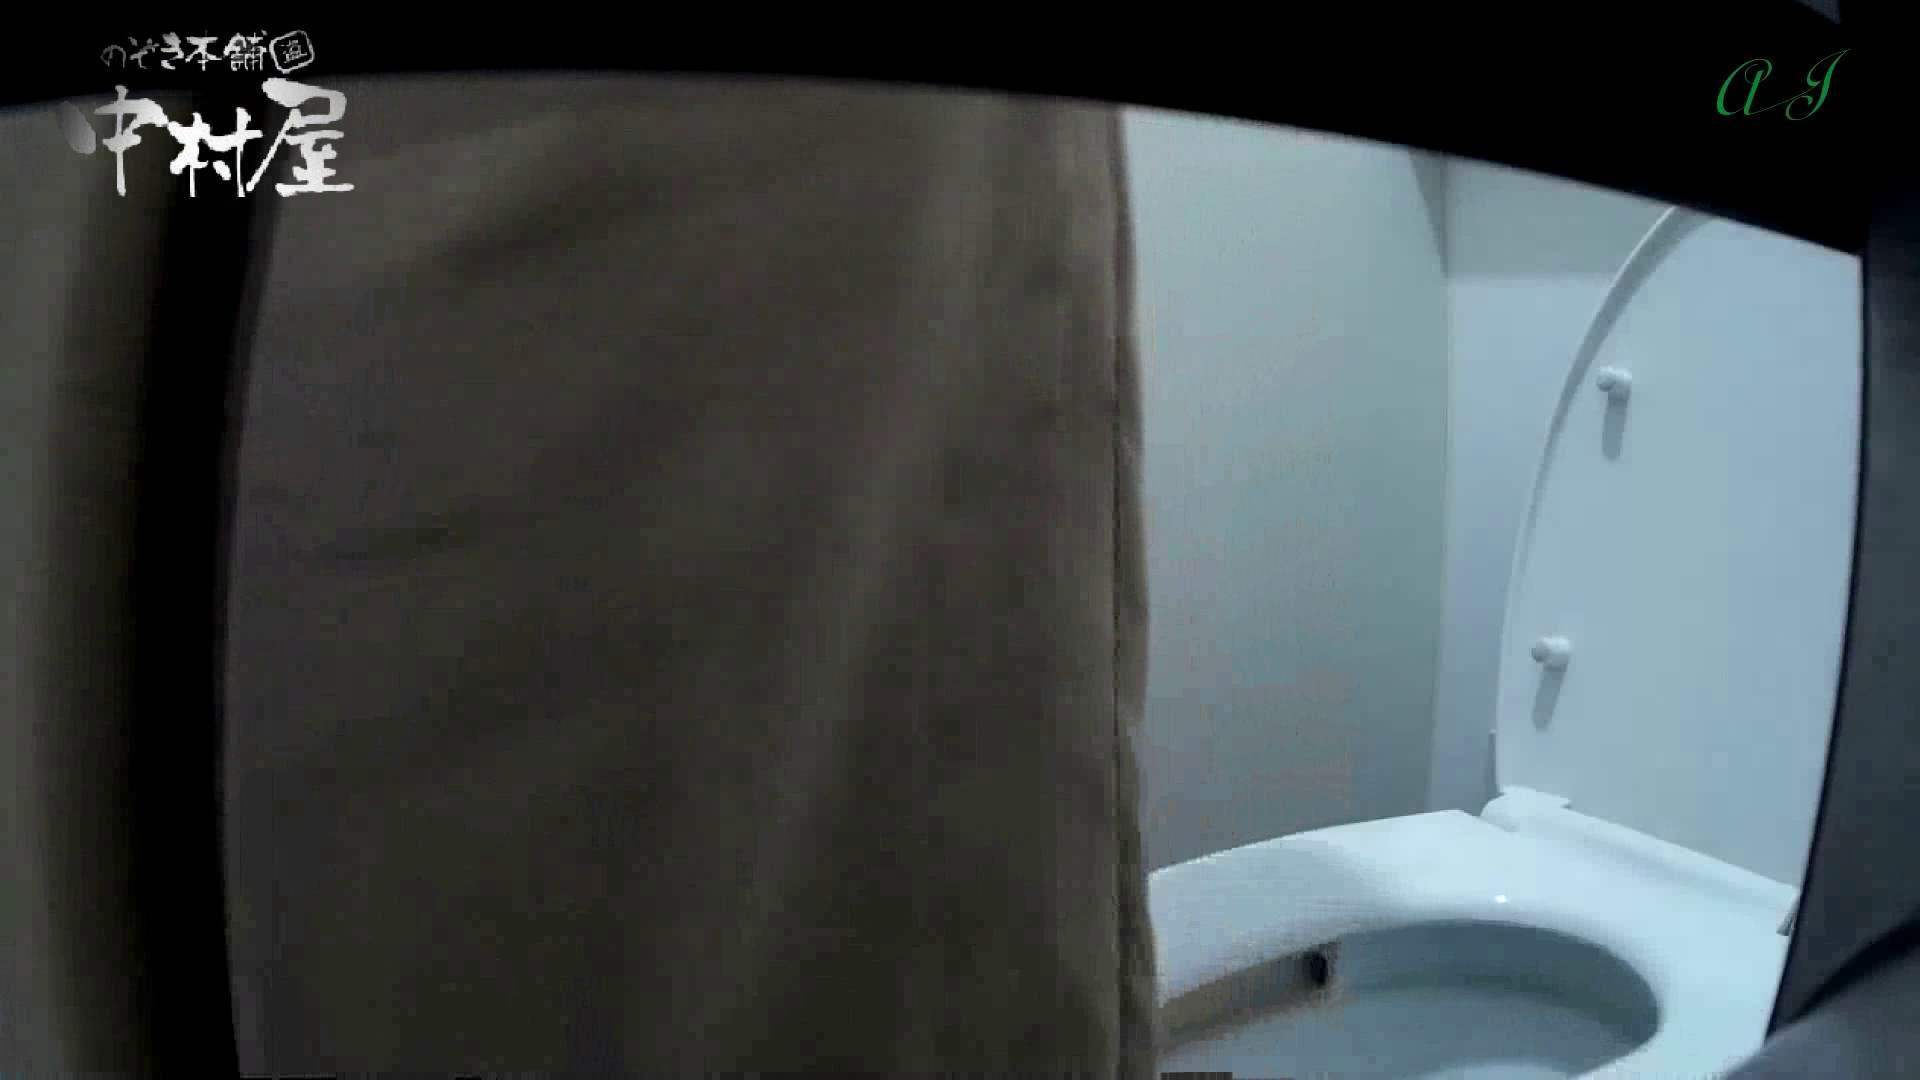 有名大学女性洗面所 vol.62 会話が弾む化粧室!! OLのエロ生活 | 洗面所  37連発 31